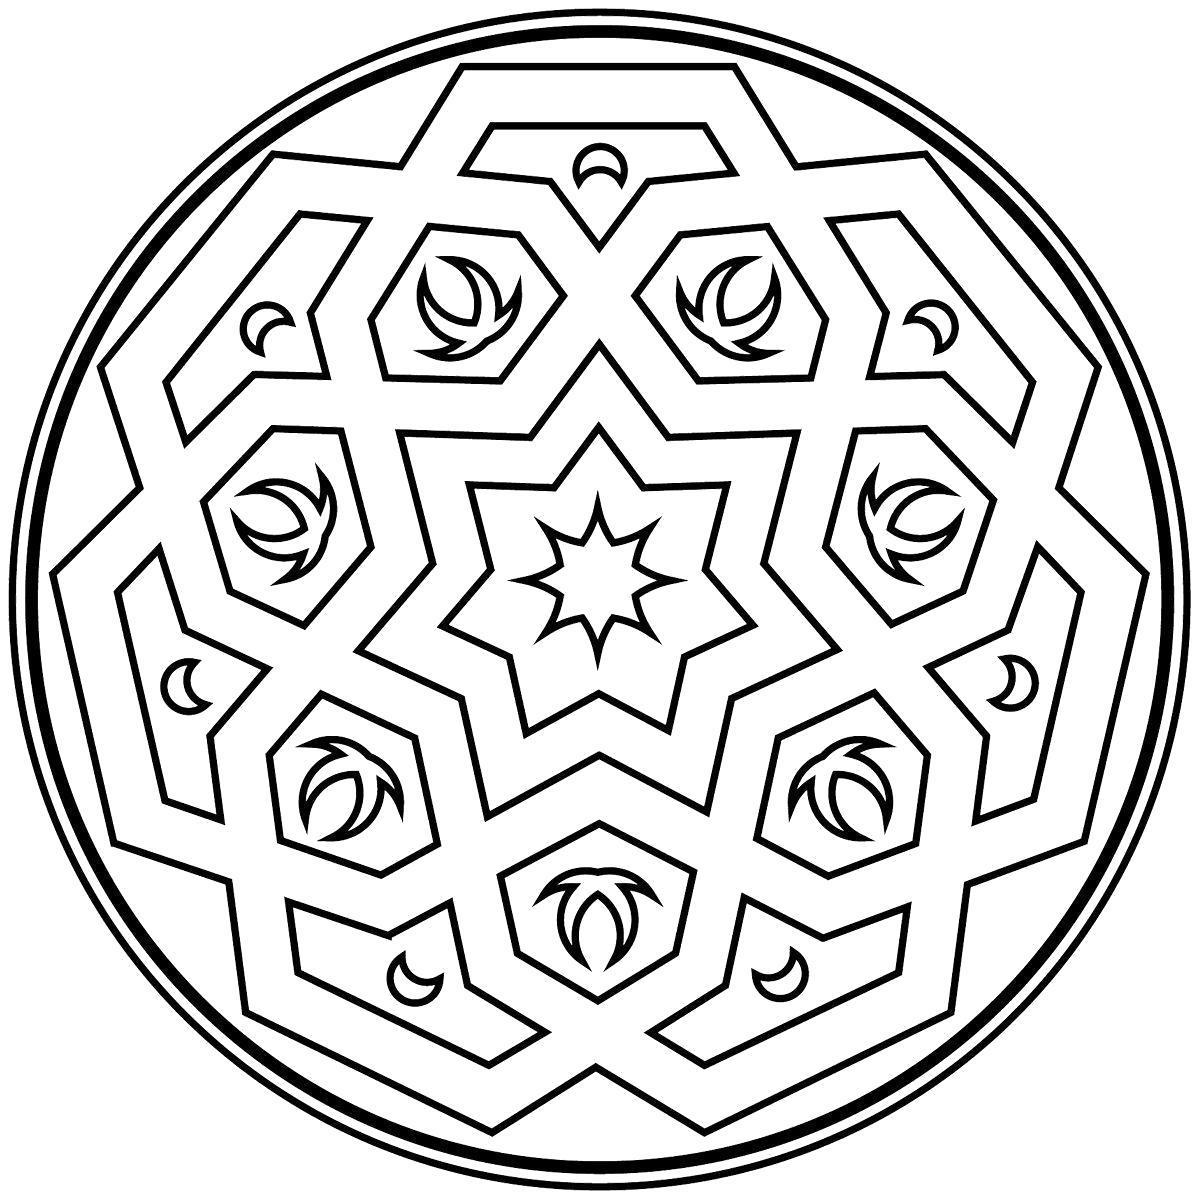 Раскраска Геометрический узор.